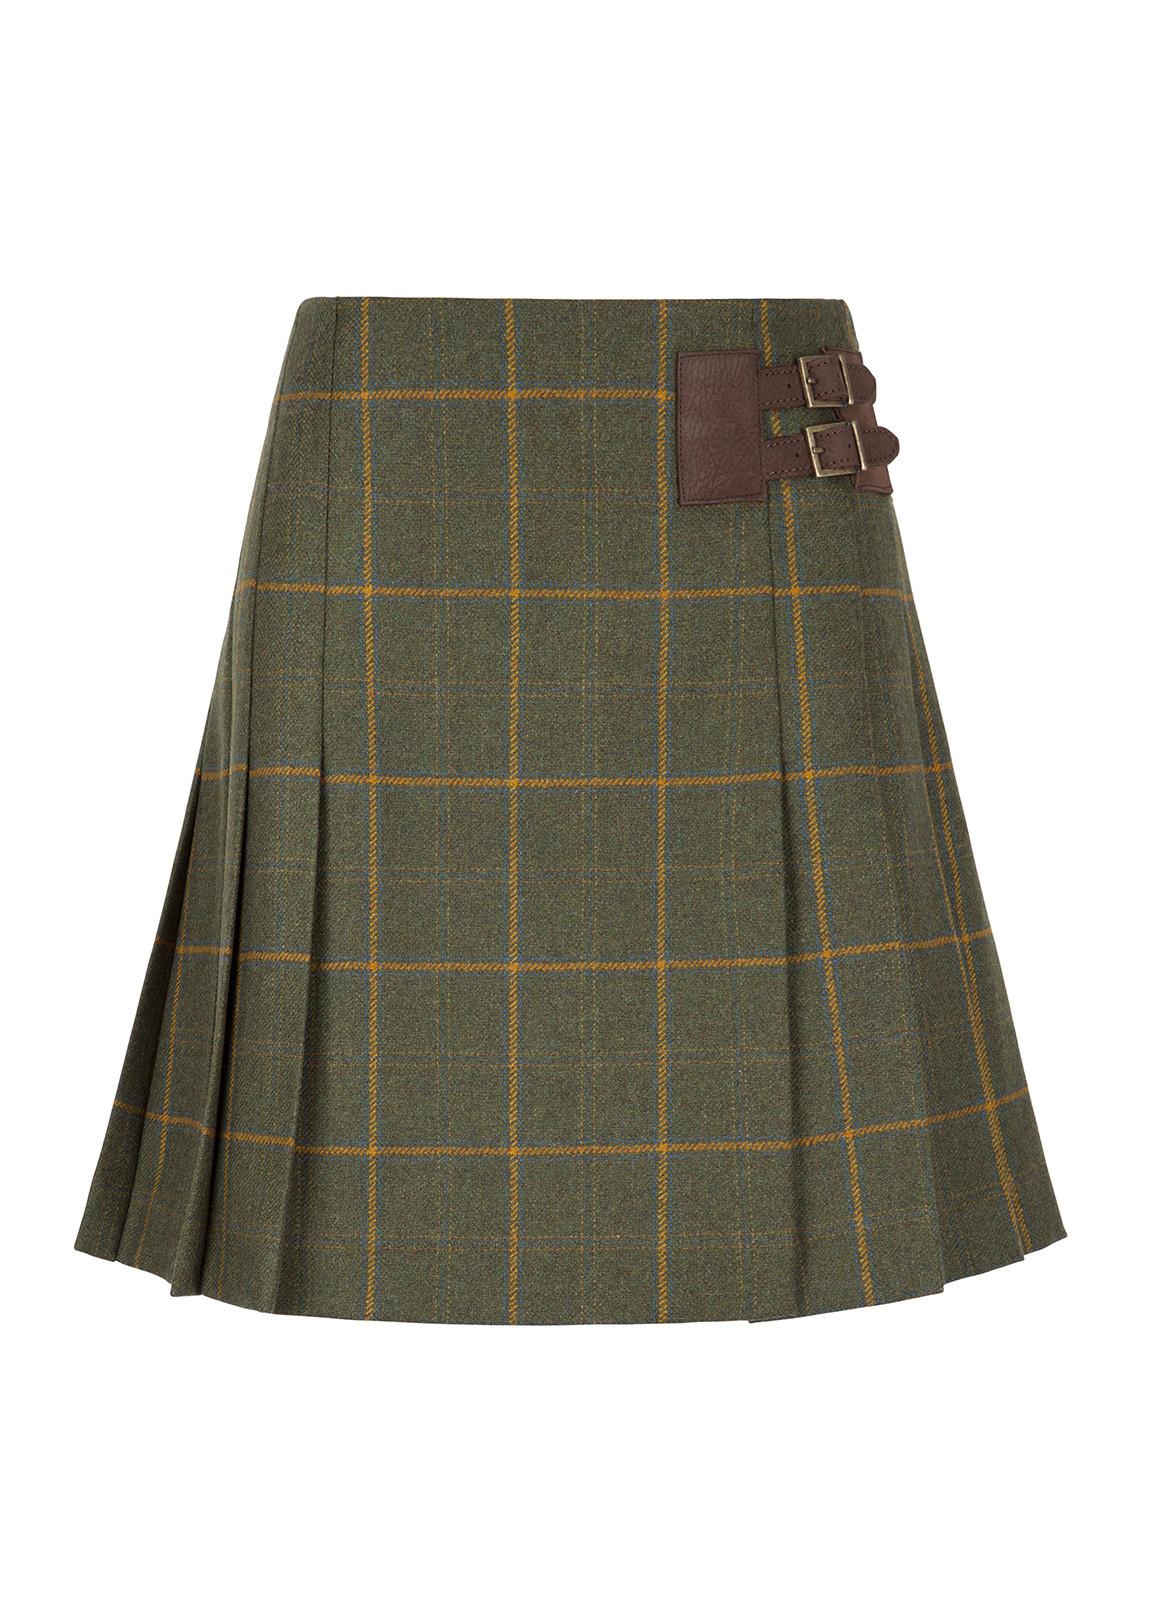 Dubarry_ Foxglove Tweed Skirt - Whiskey_Image_2